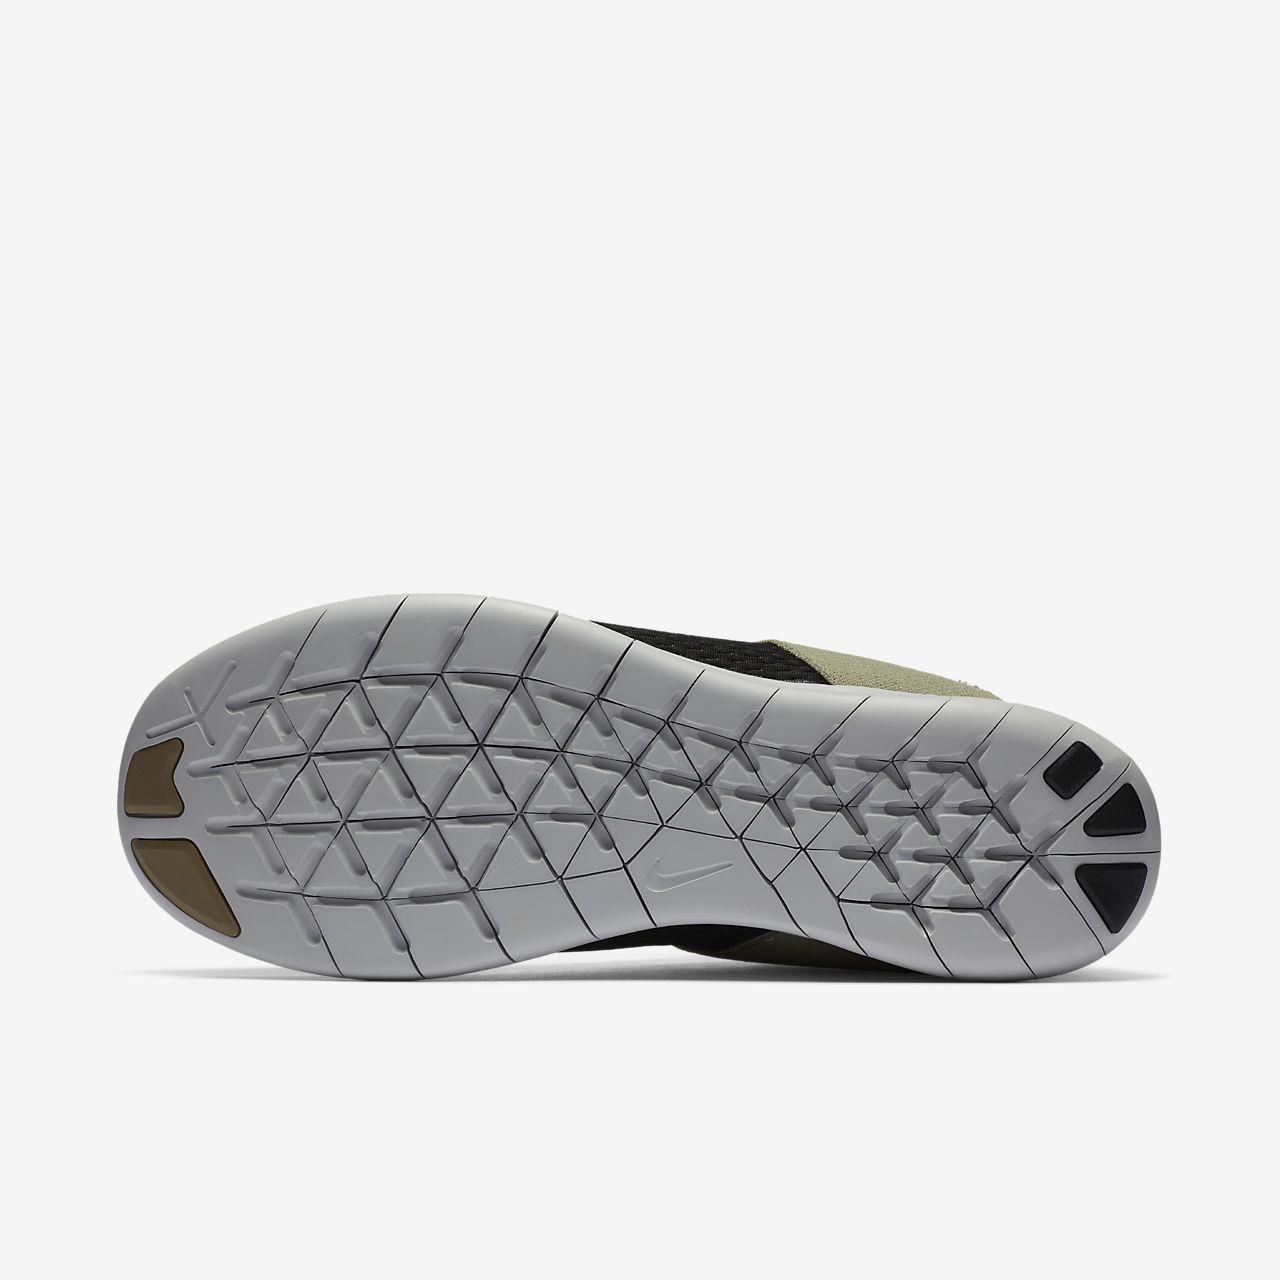 ... Nike Free RN Commuter 2017 Men's Running Shoe